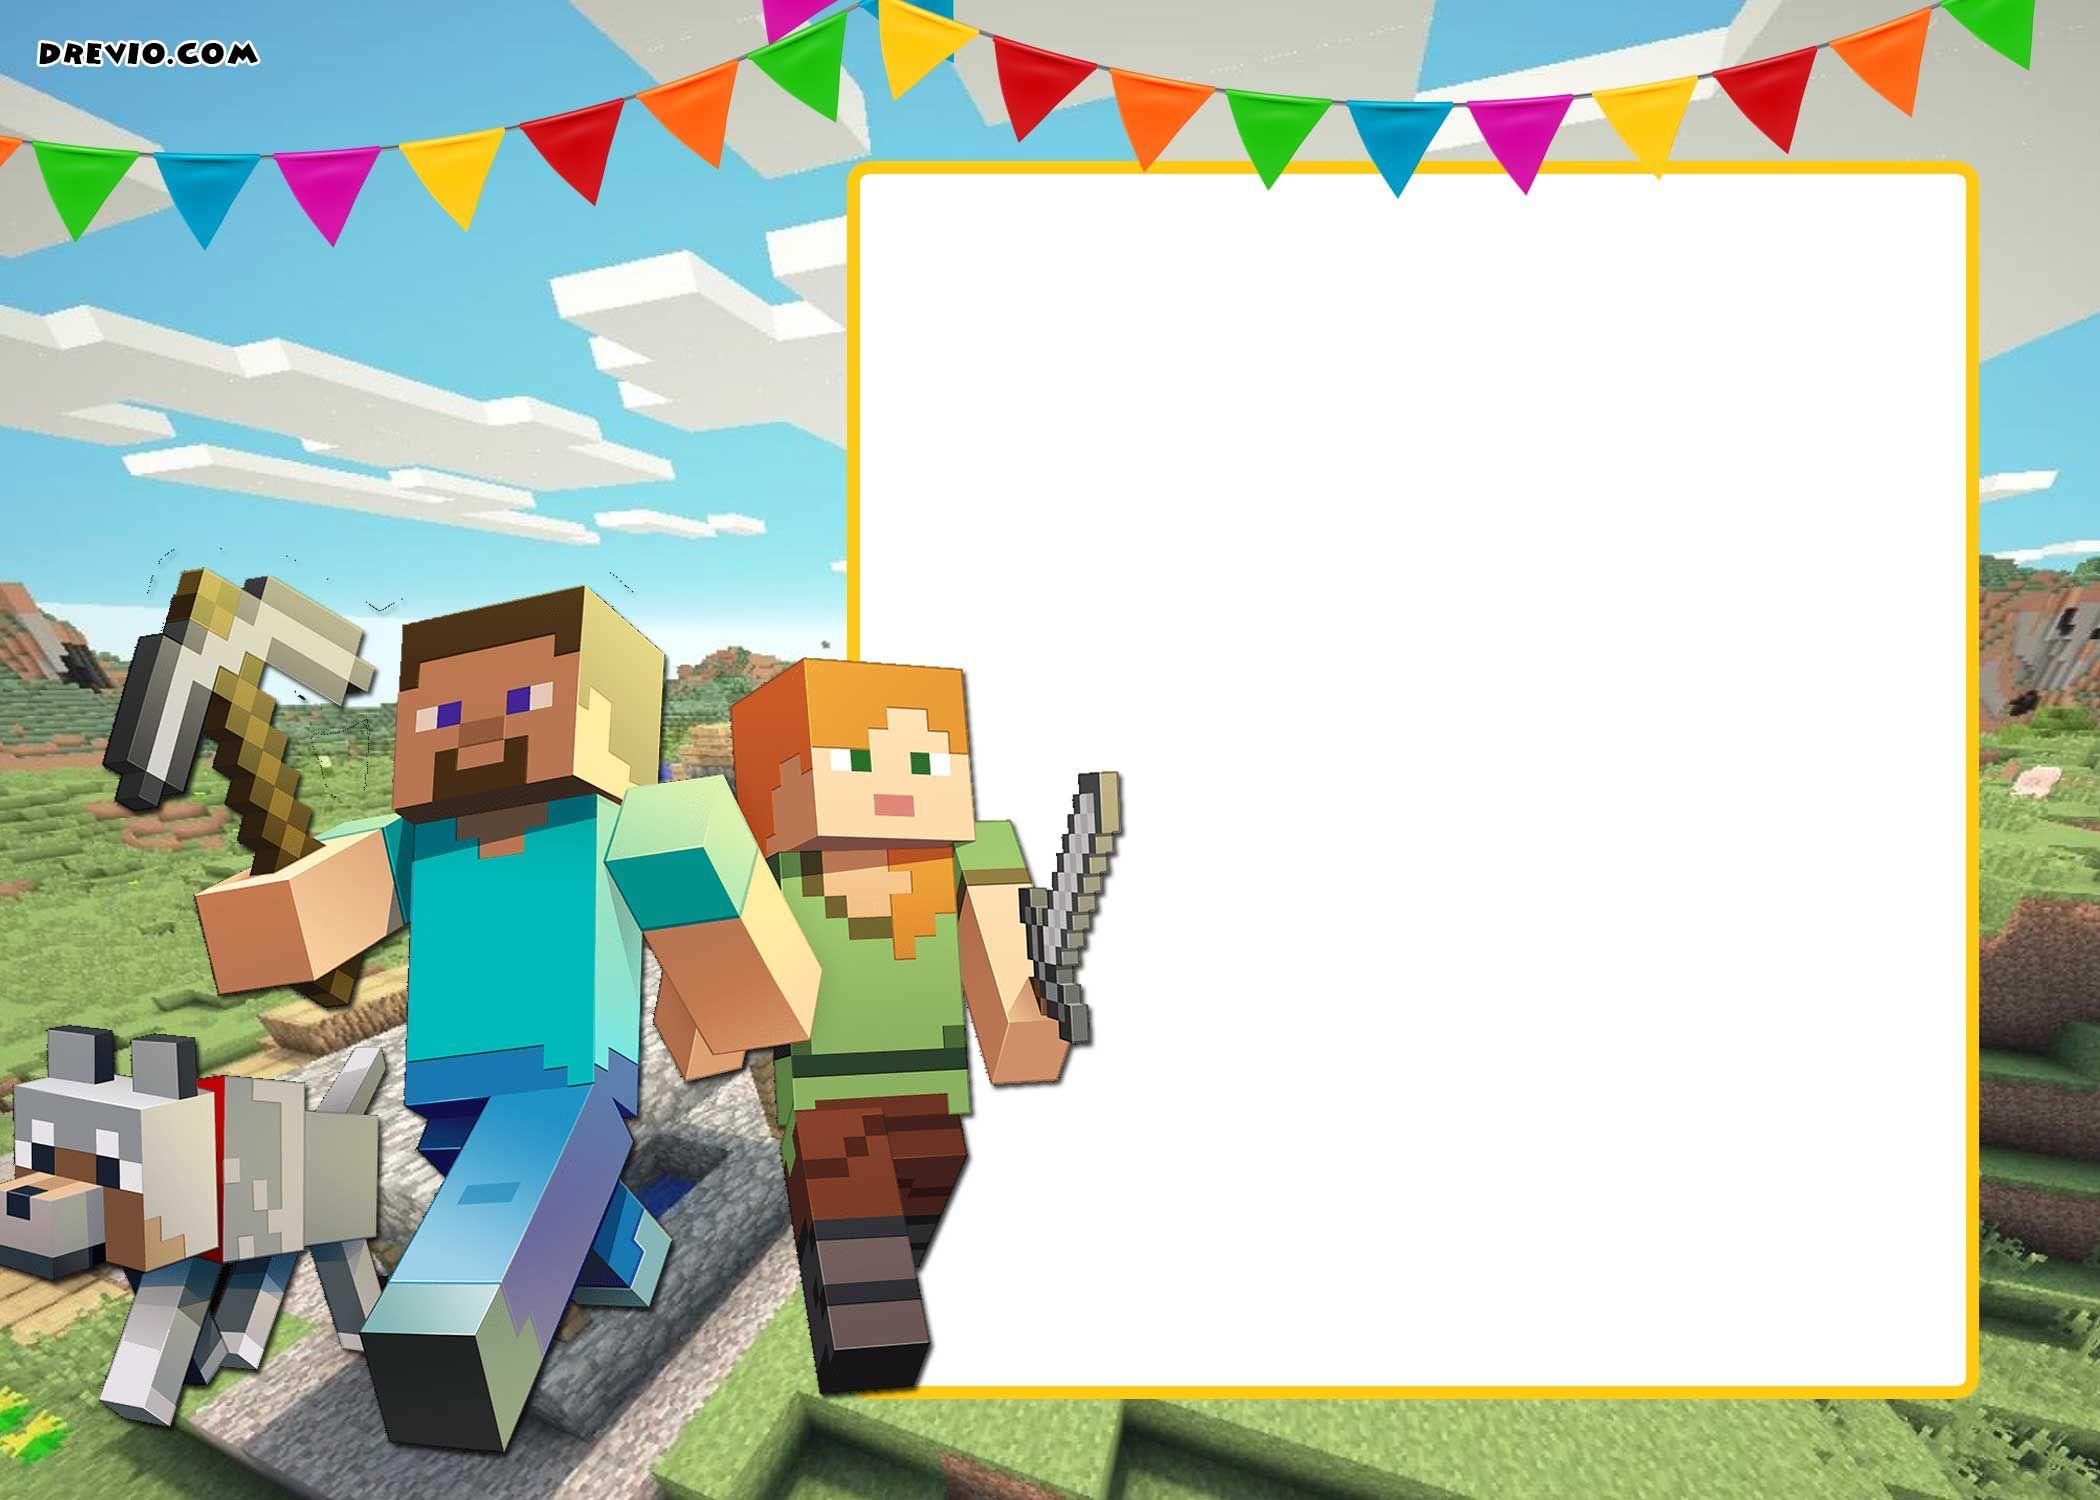 Free Printable Minecraft Birthday Invitation | Free Printable - Free Printable Minecraft Birthday Party Invitations Templates